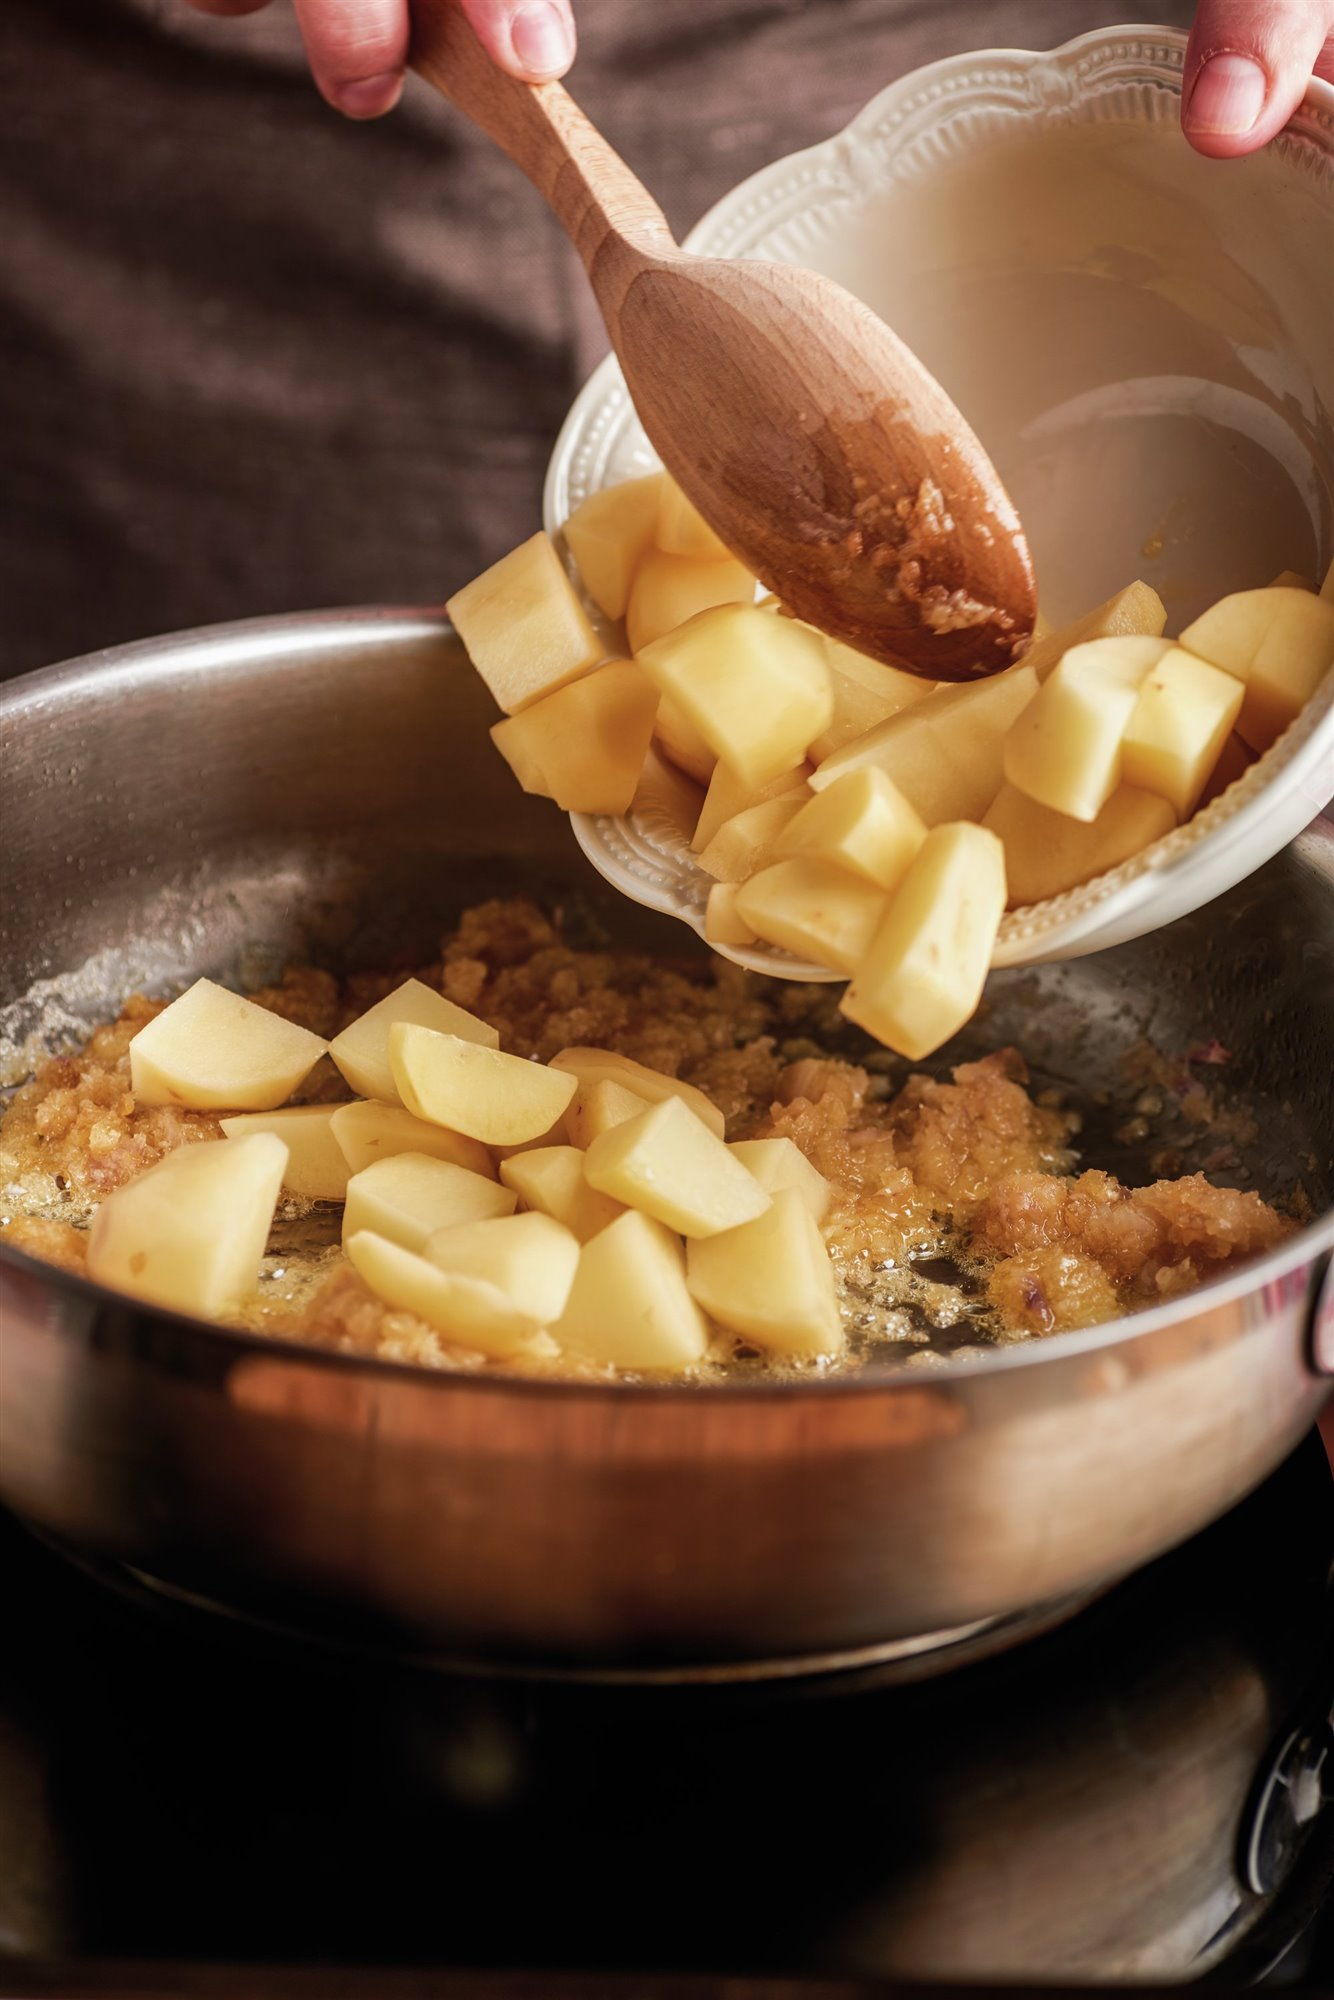 1. Incorpora las patatas